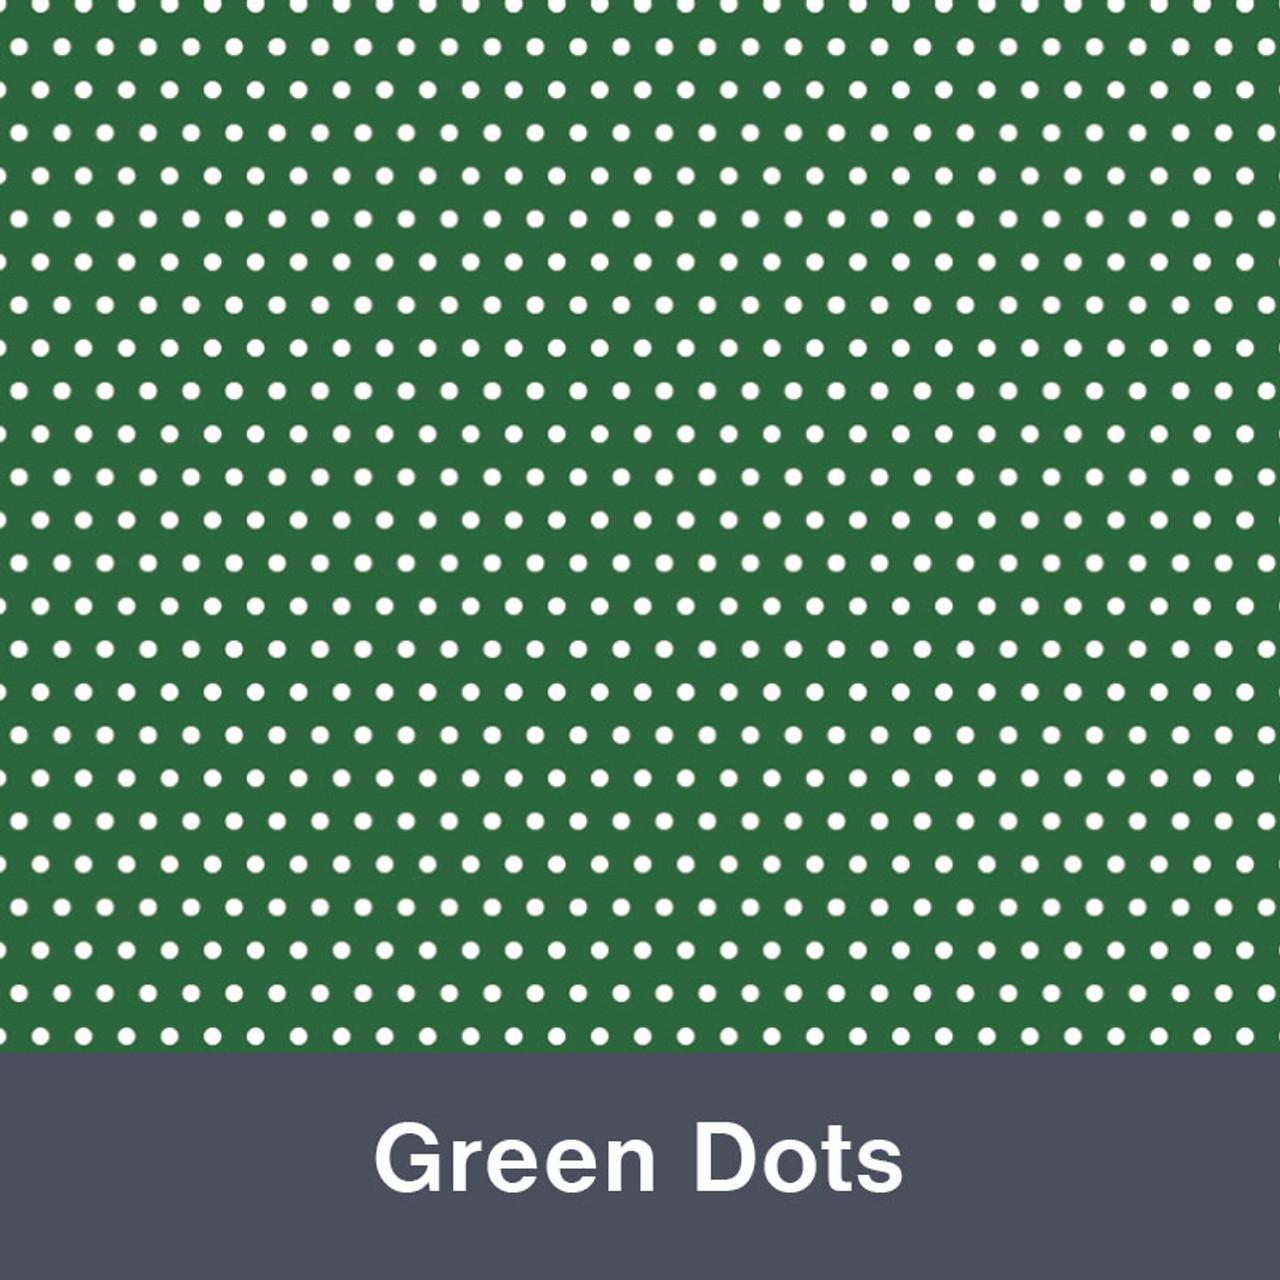 Green Dots